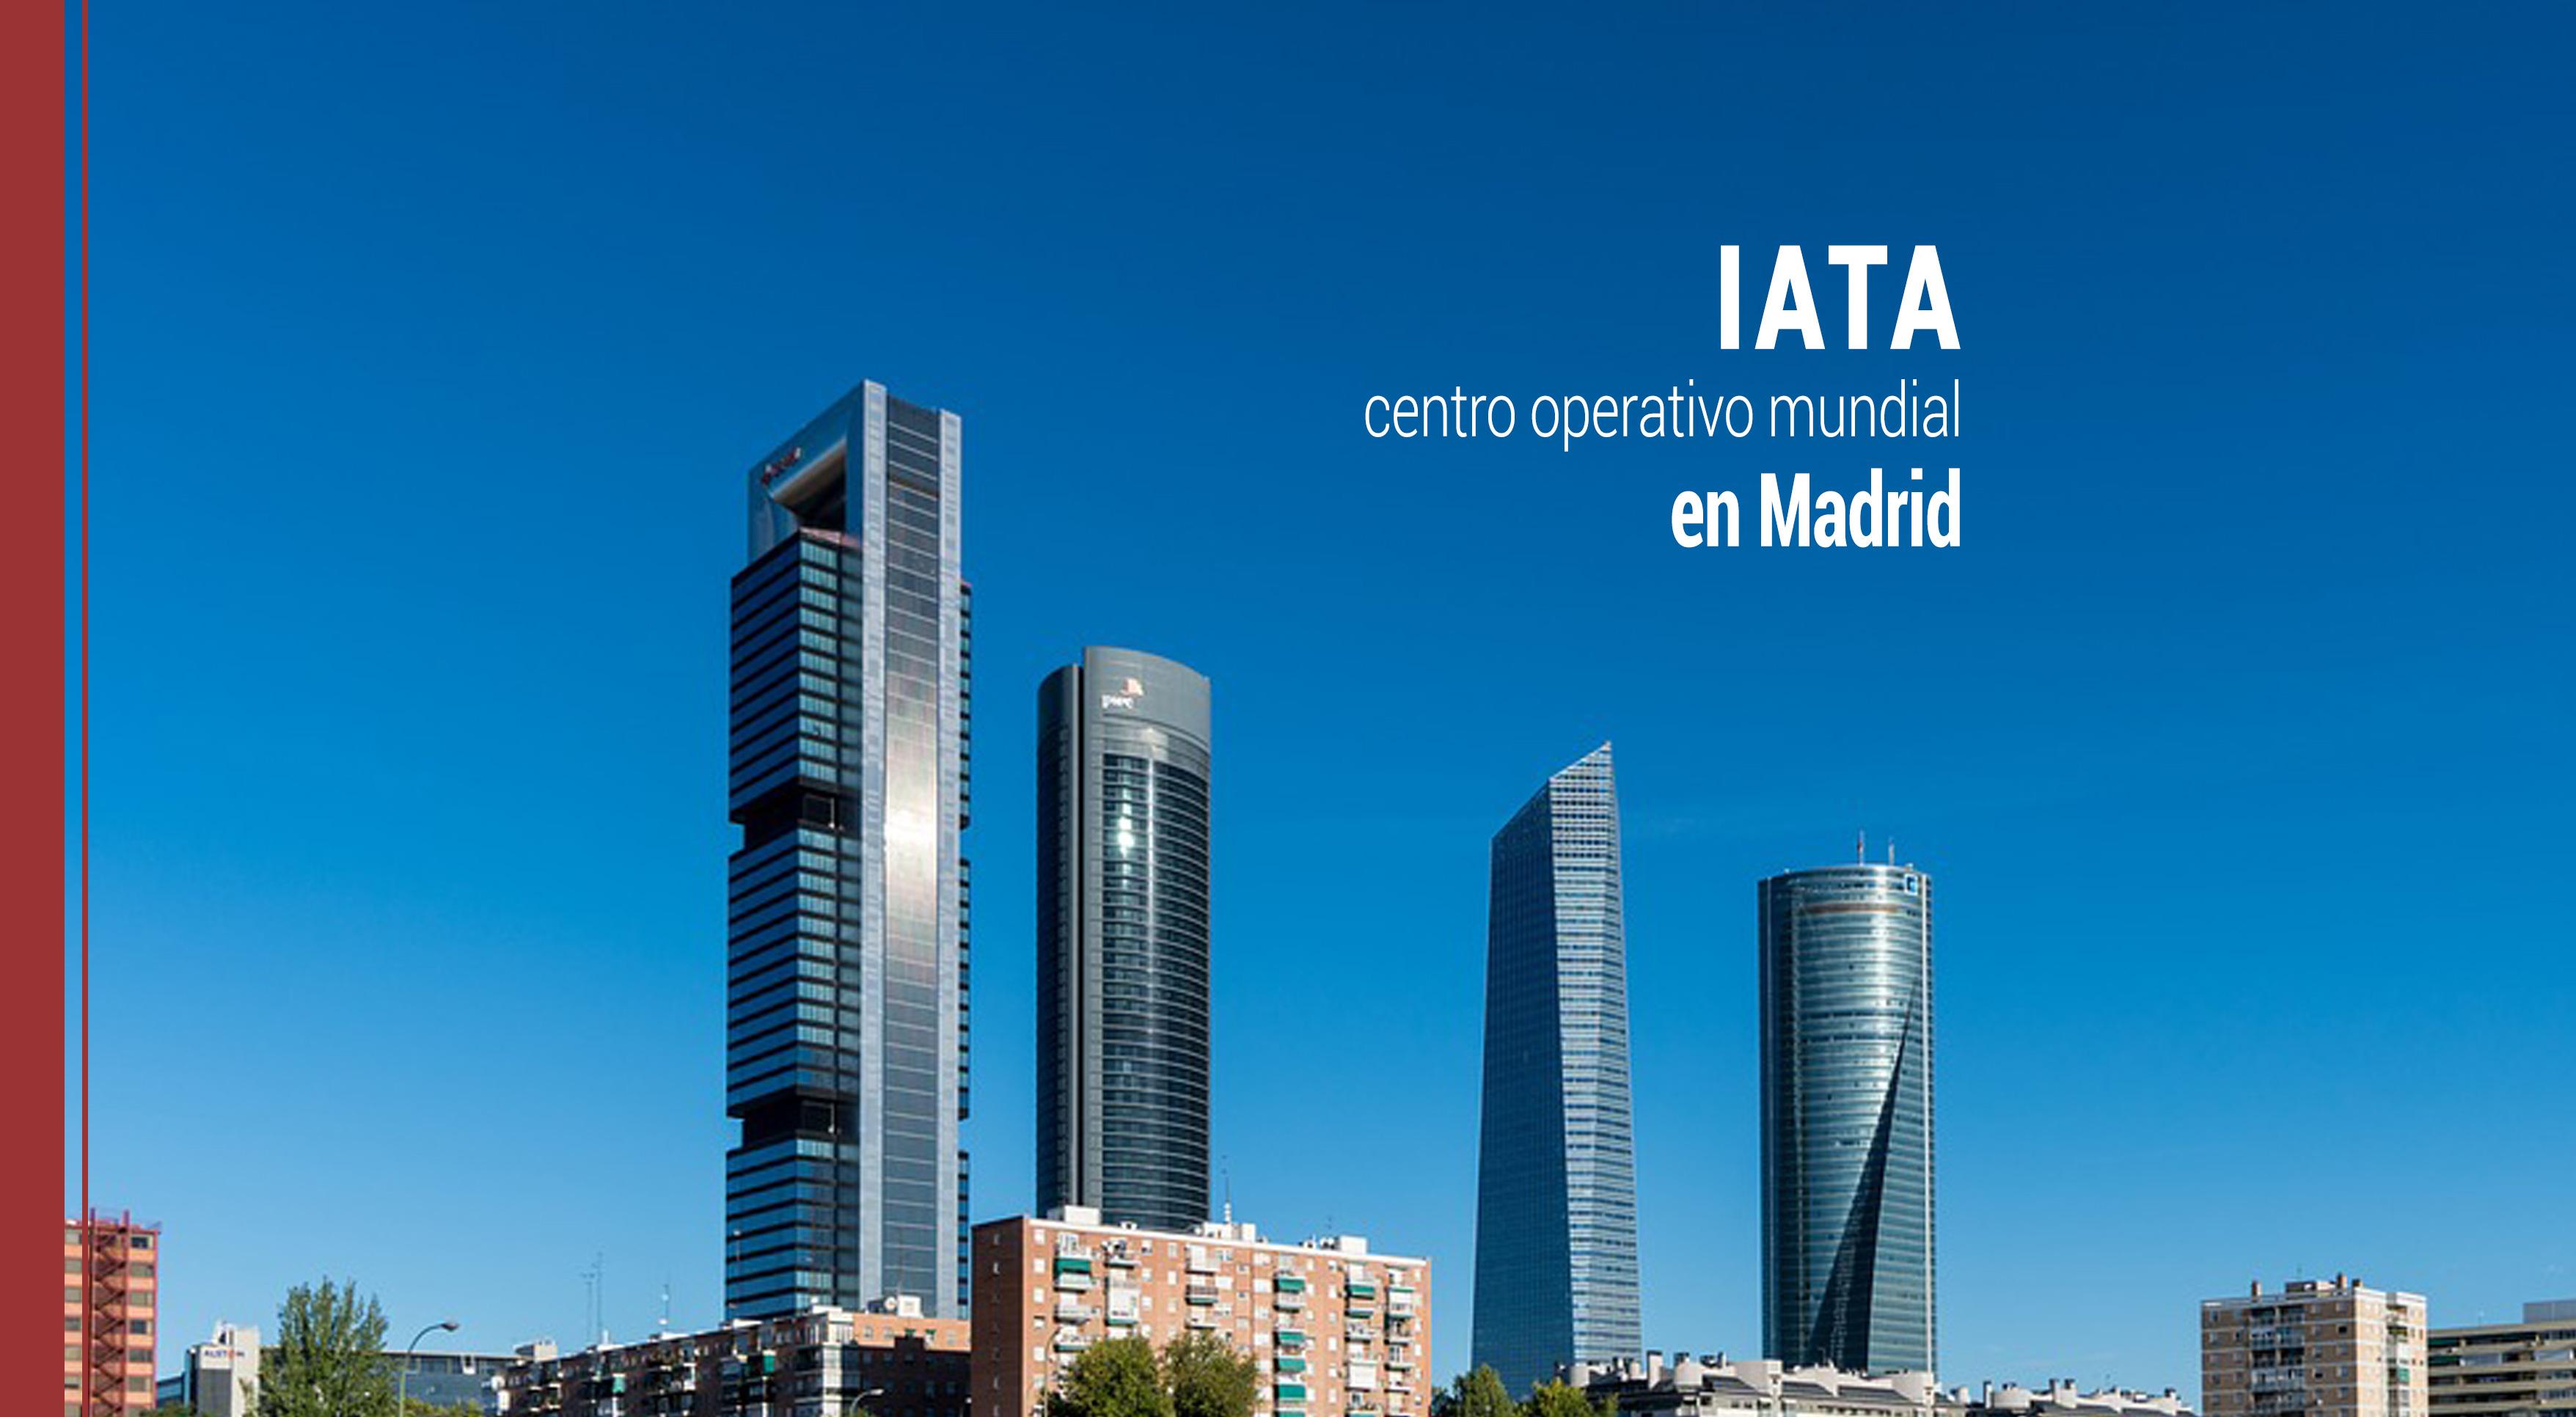 iata-centro-operativo-madrid IATA implementa su centro operativo mundial en Madrid